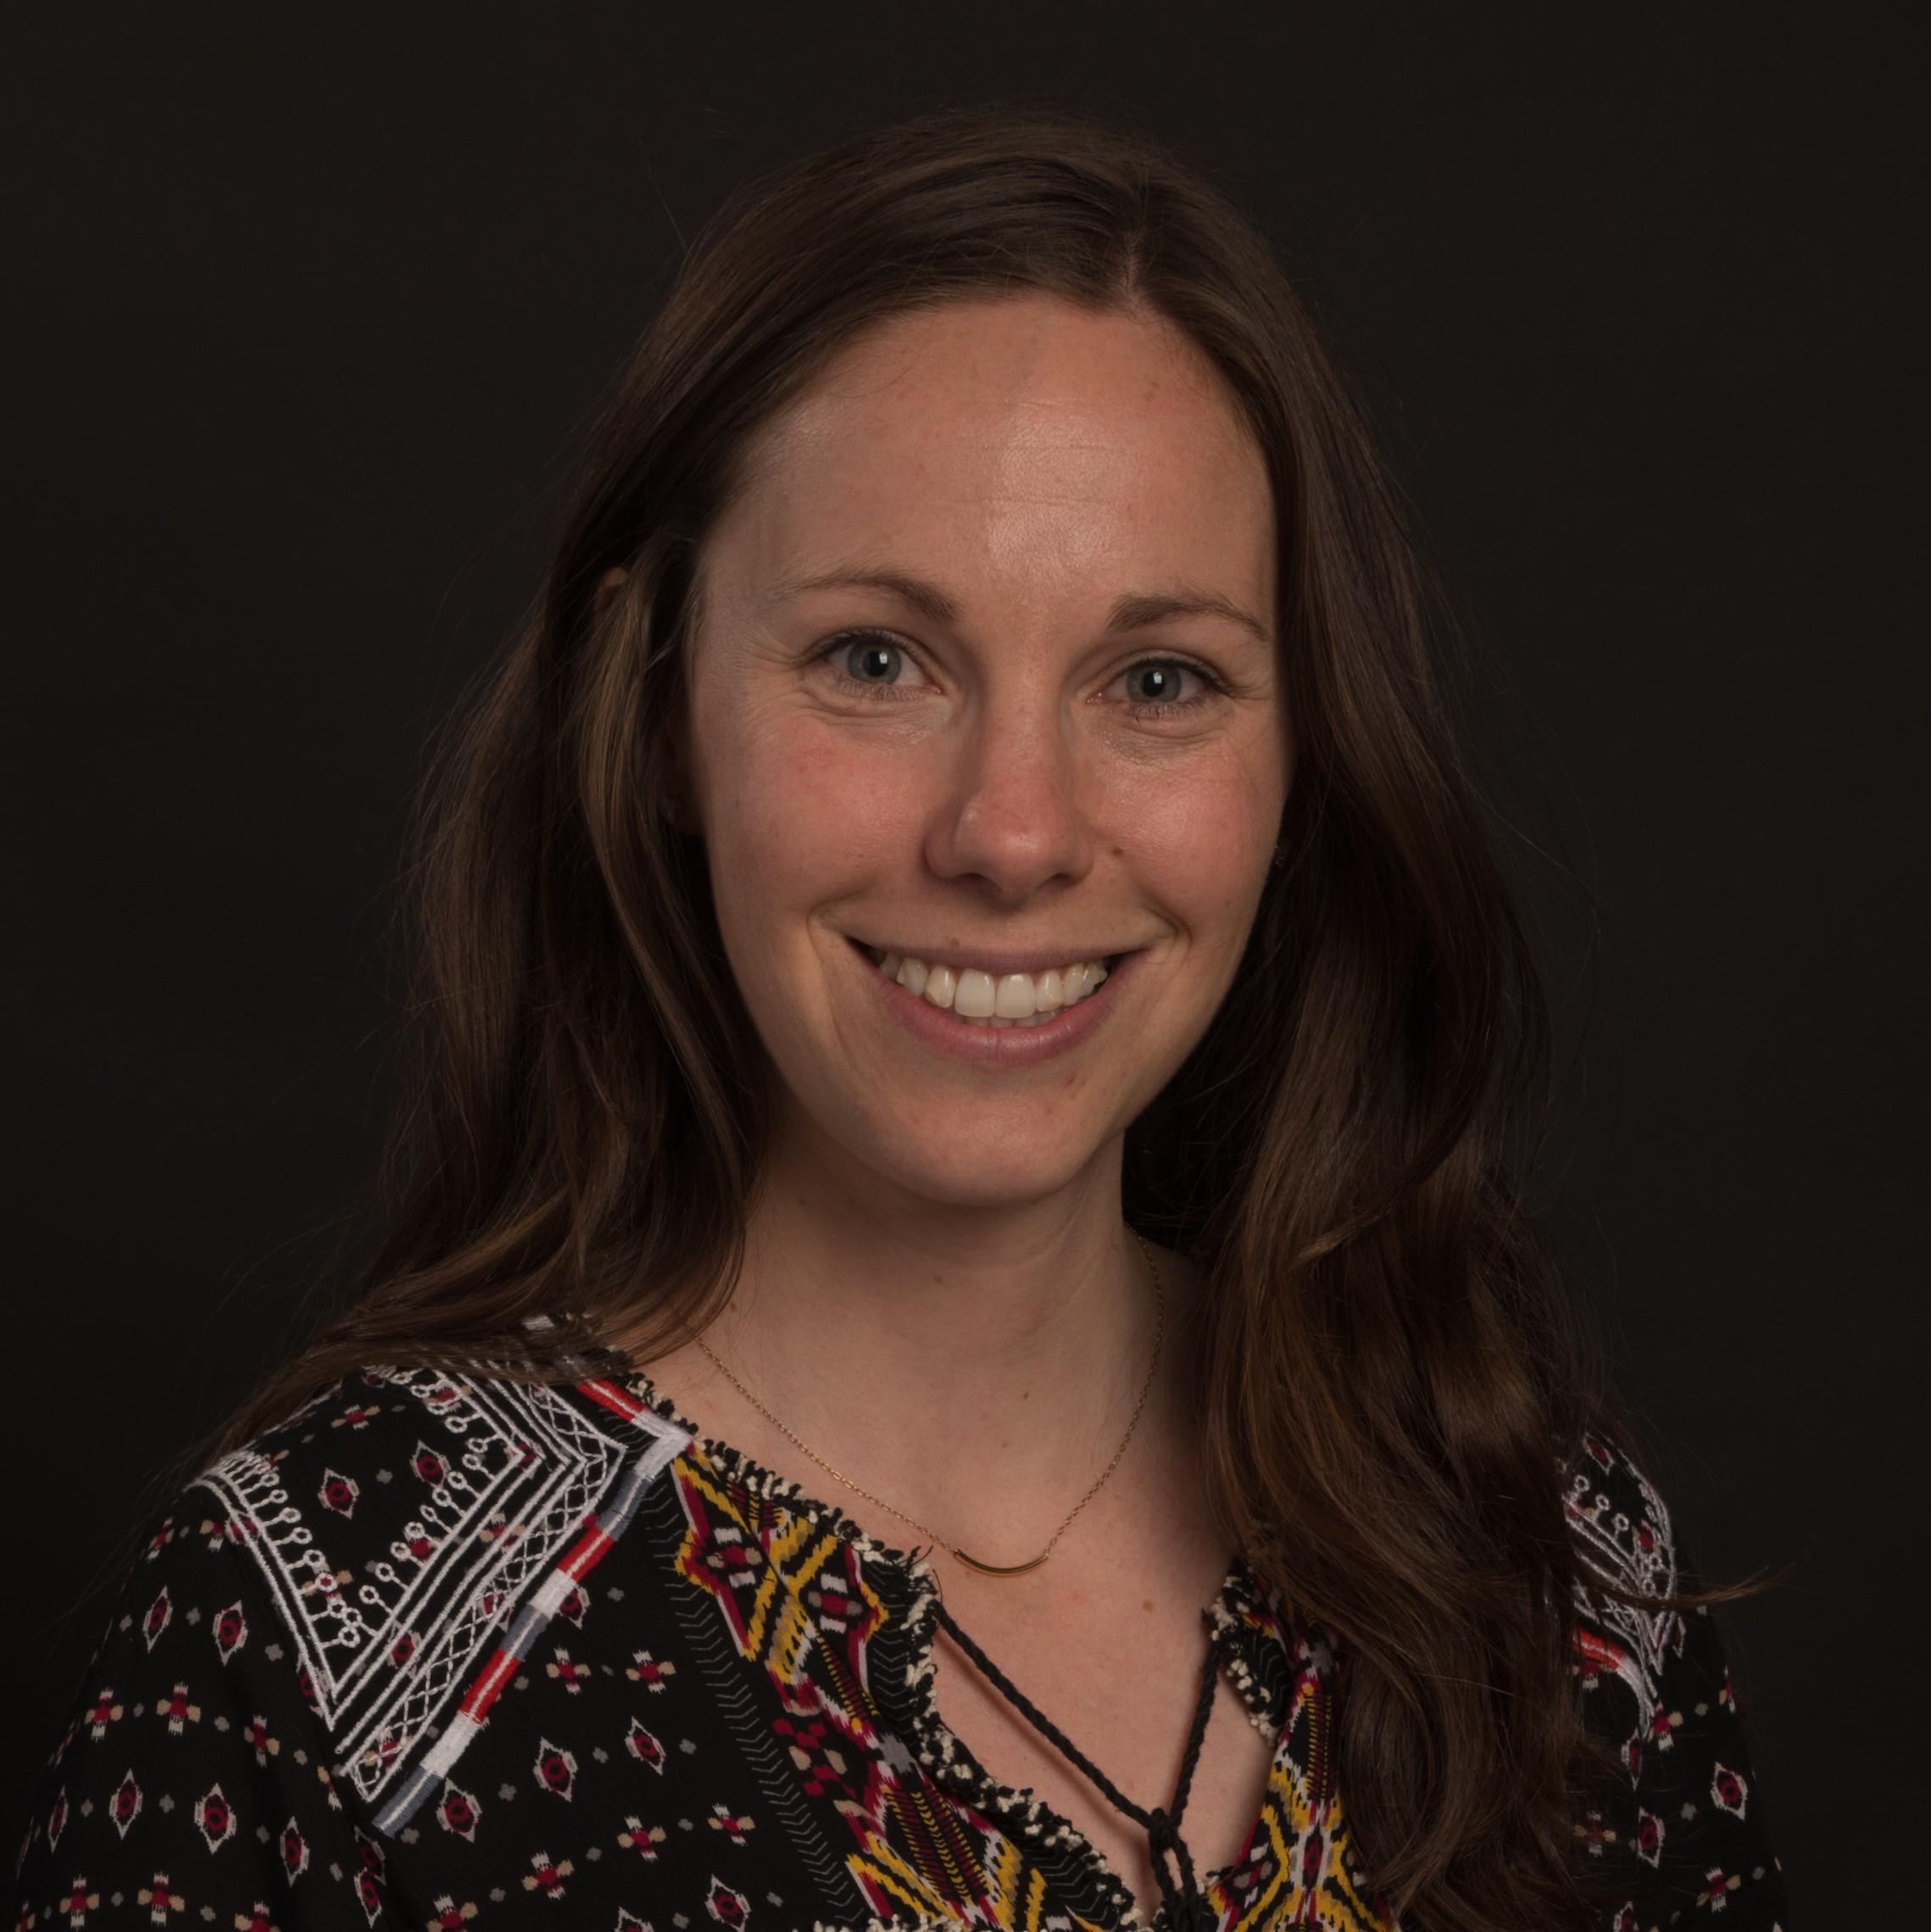 Erin Nobler